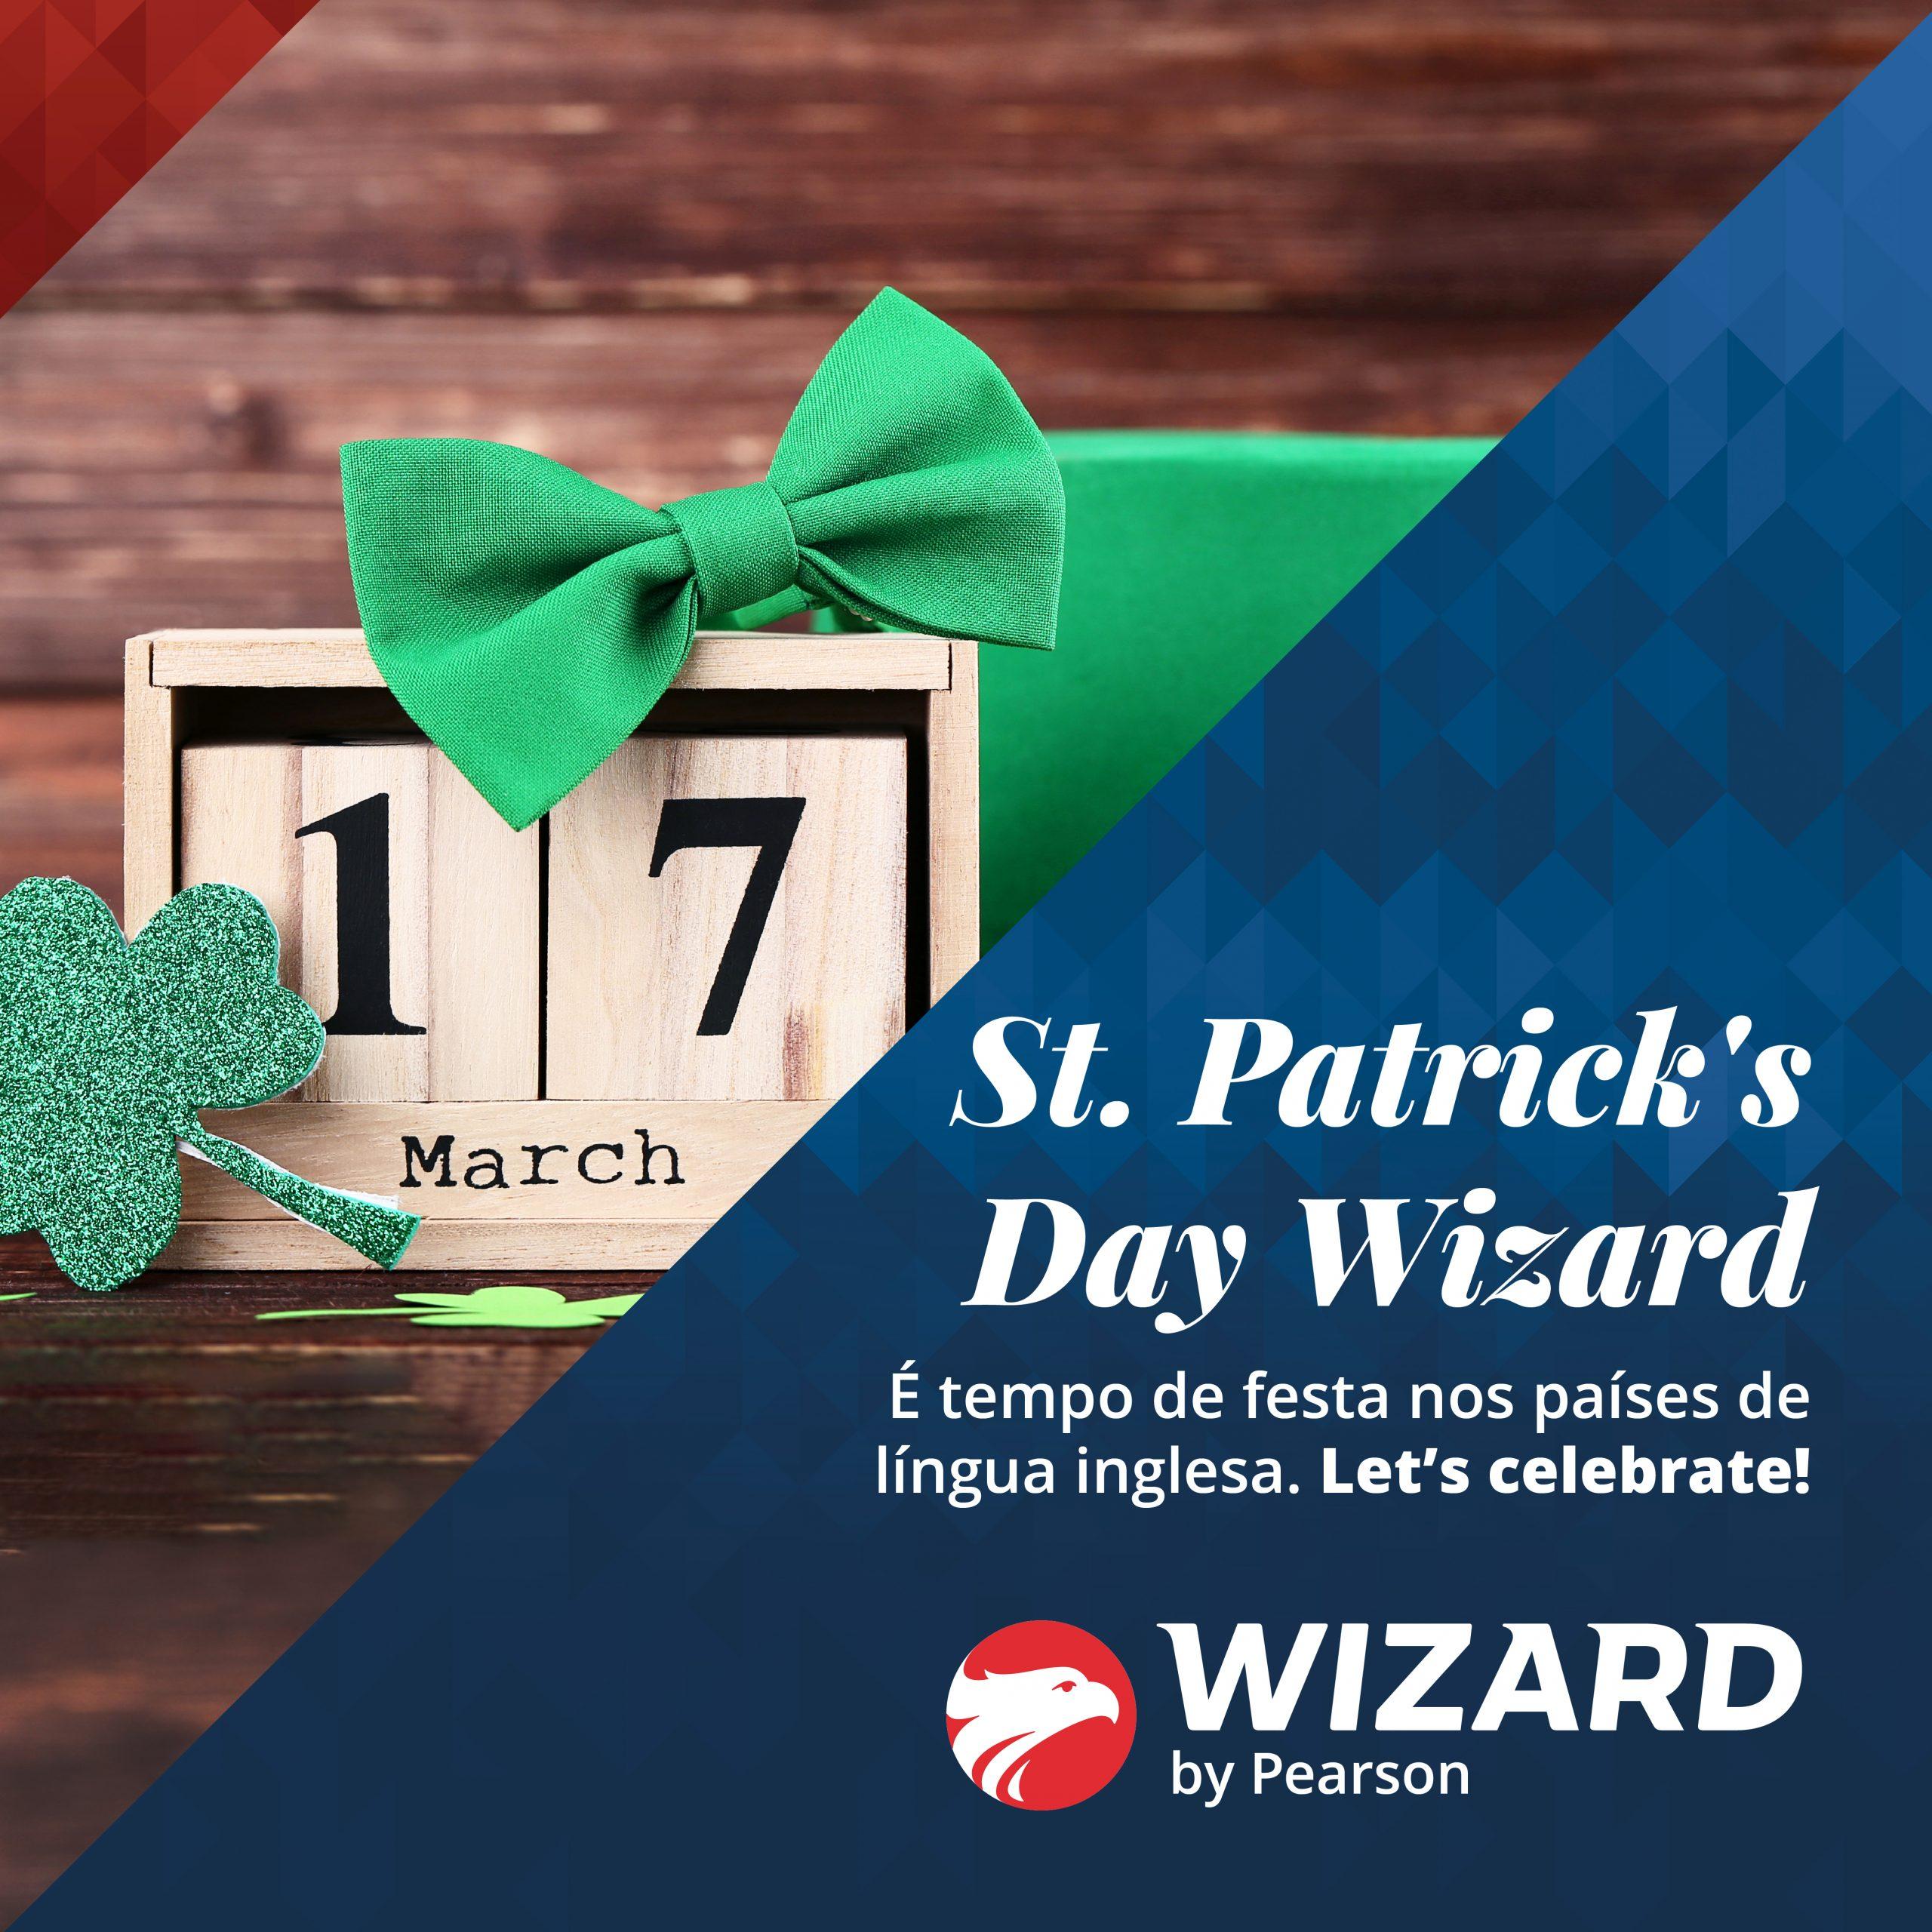 Saint Patricks day Wizard